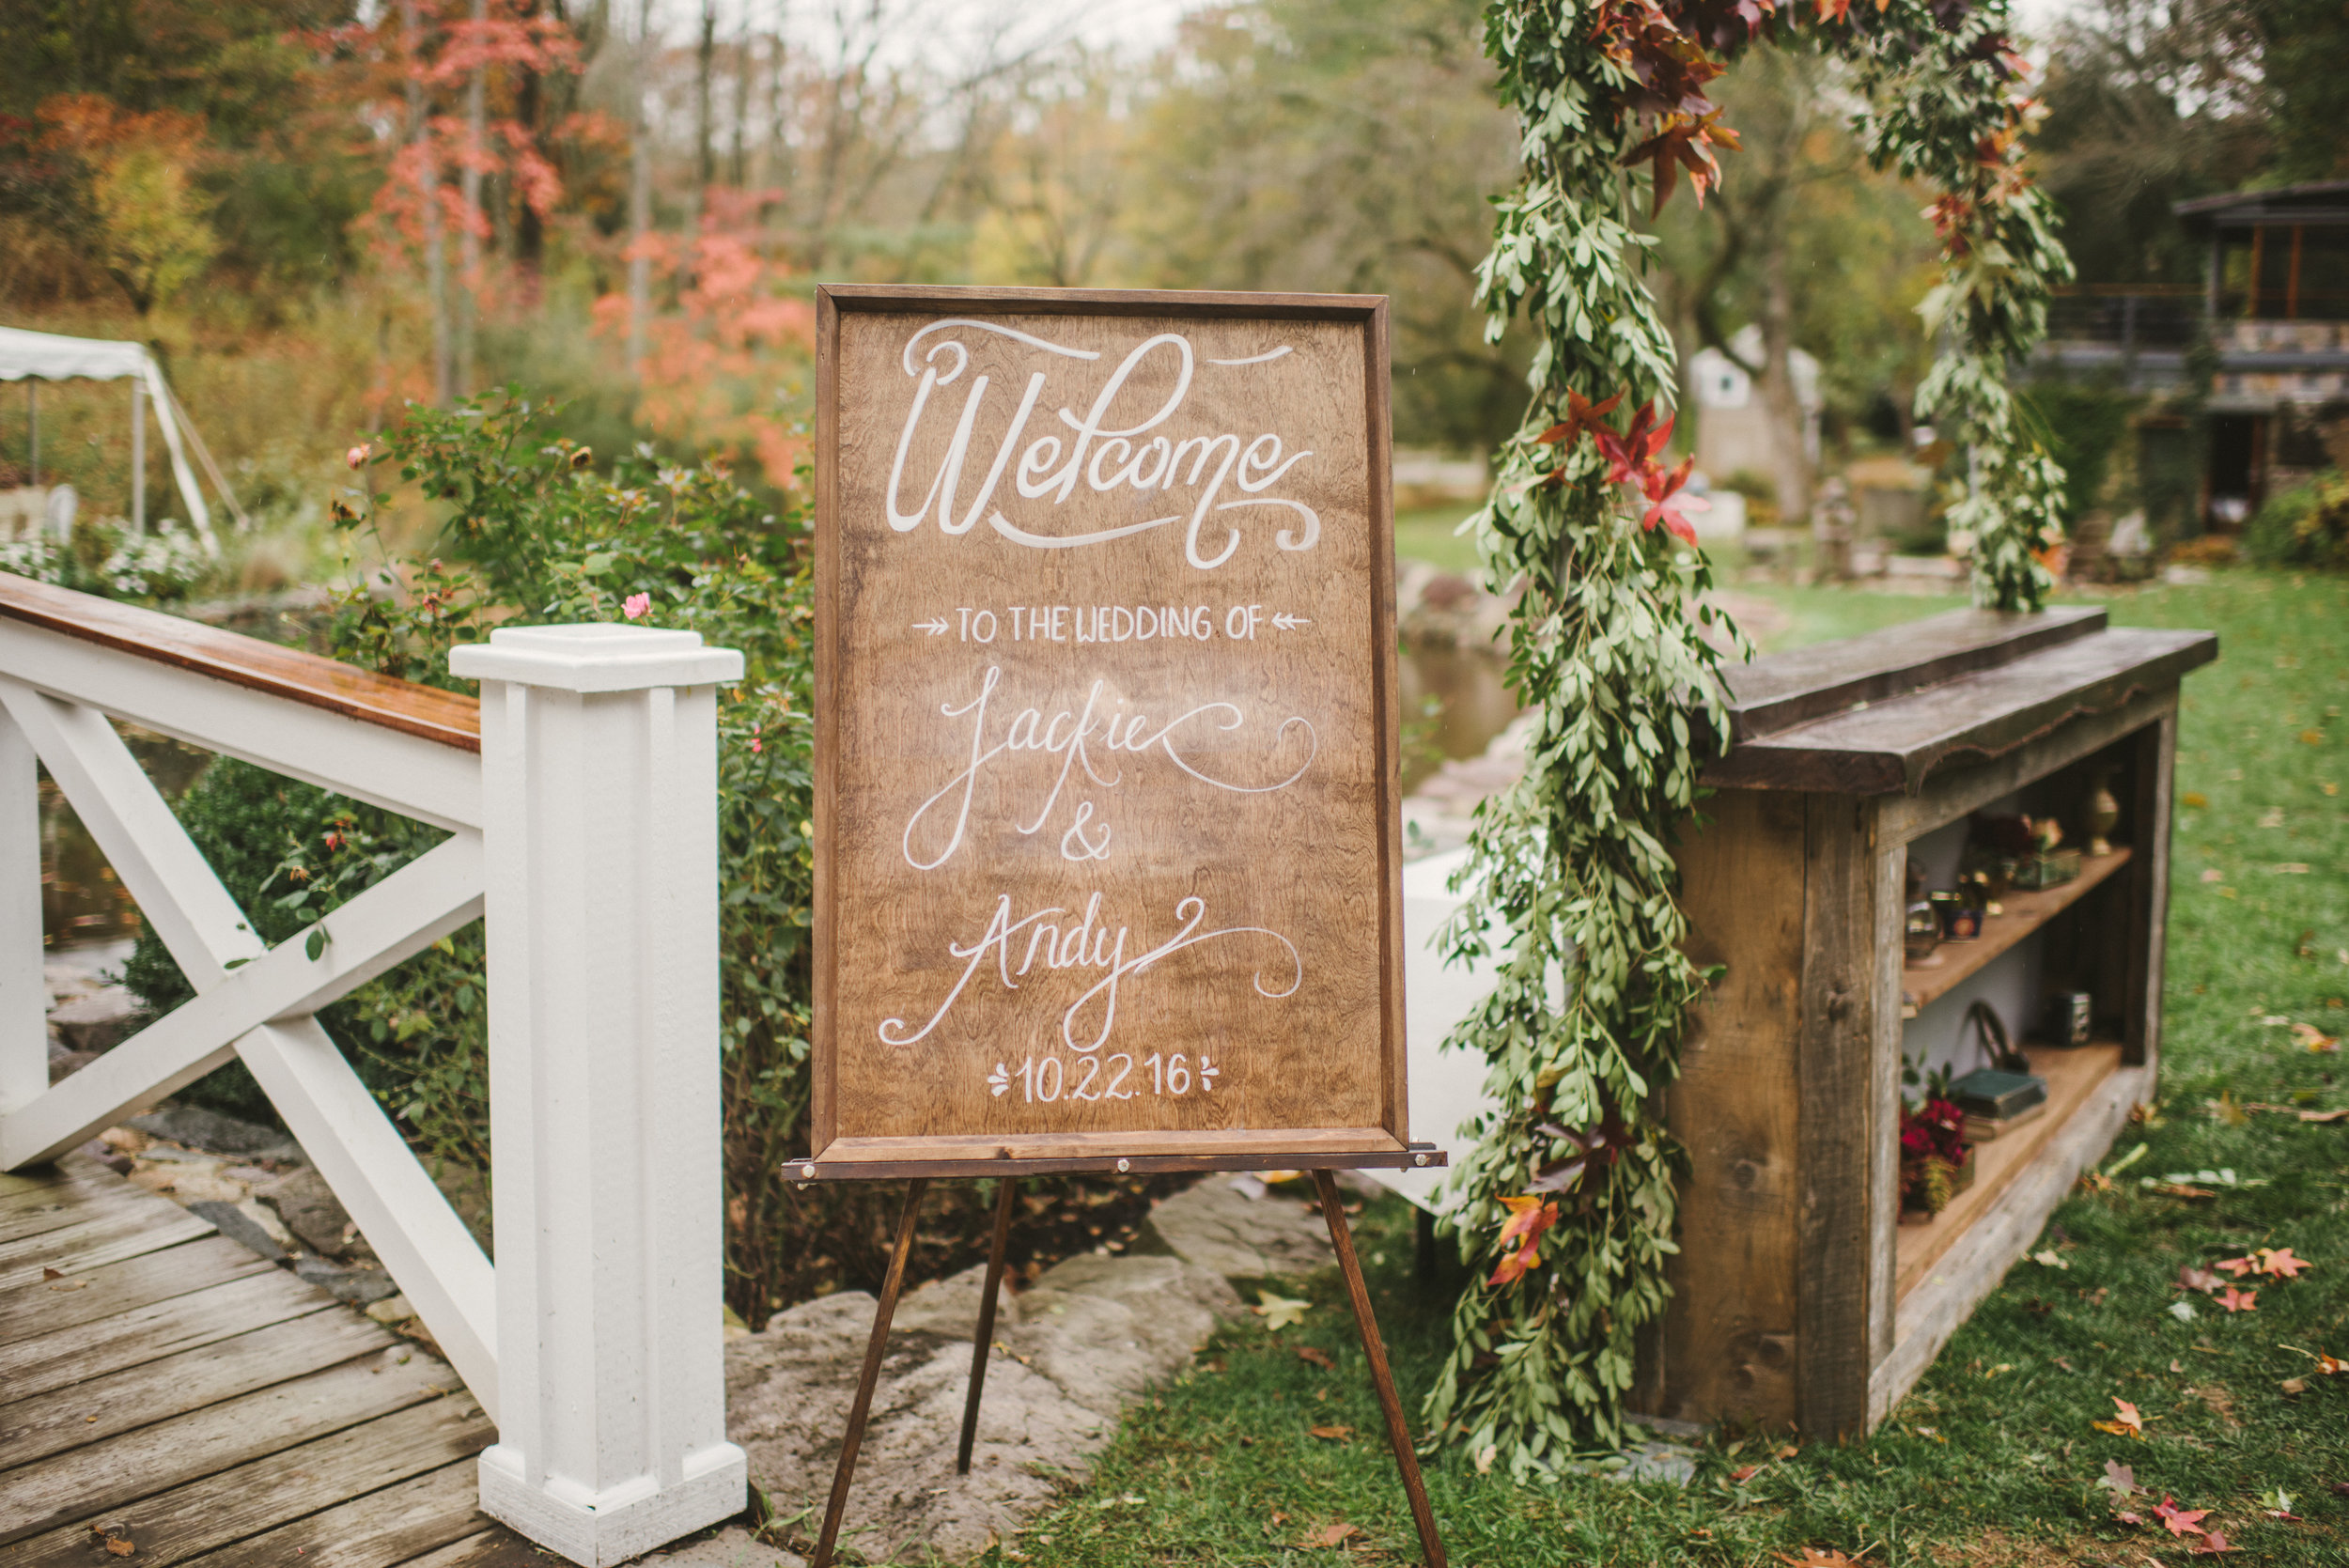 JACQUELINE & ANDREW WARSHAWER -BROOKMILL FARM FALL WEDDING - INTIMATE WEDDING PHOTOGRAPHER - TWOTWENTY by CHI-CHI AGBIM-143.jpg